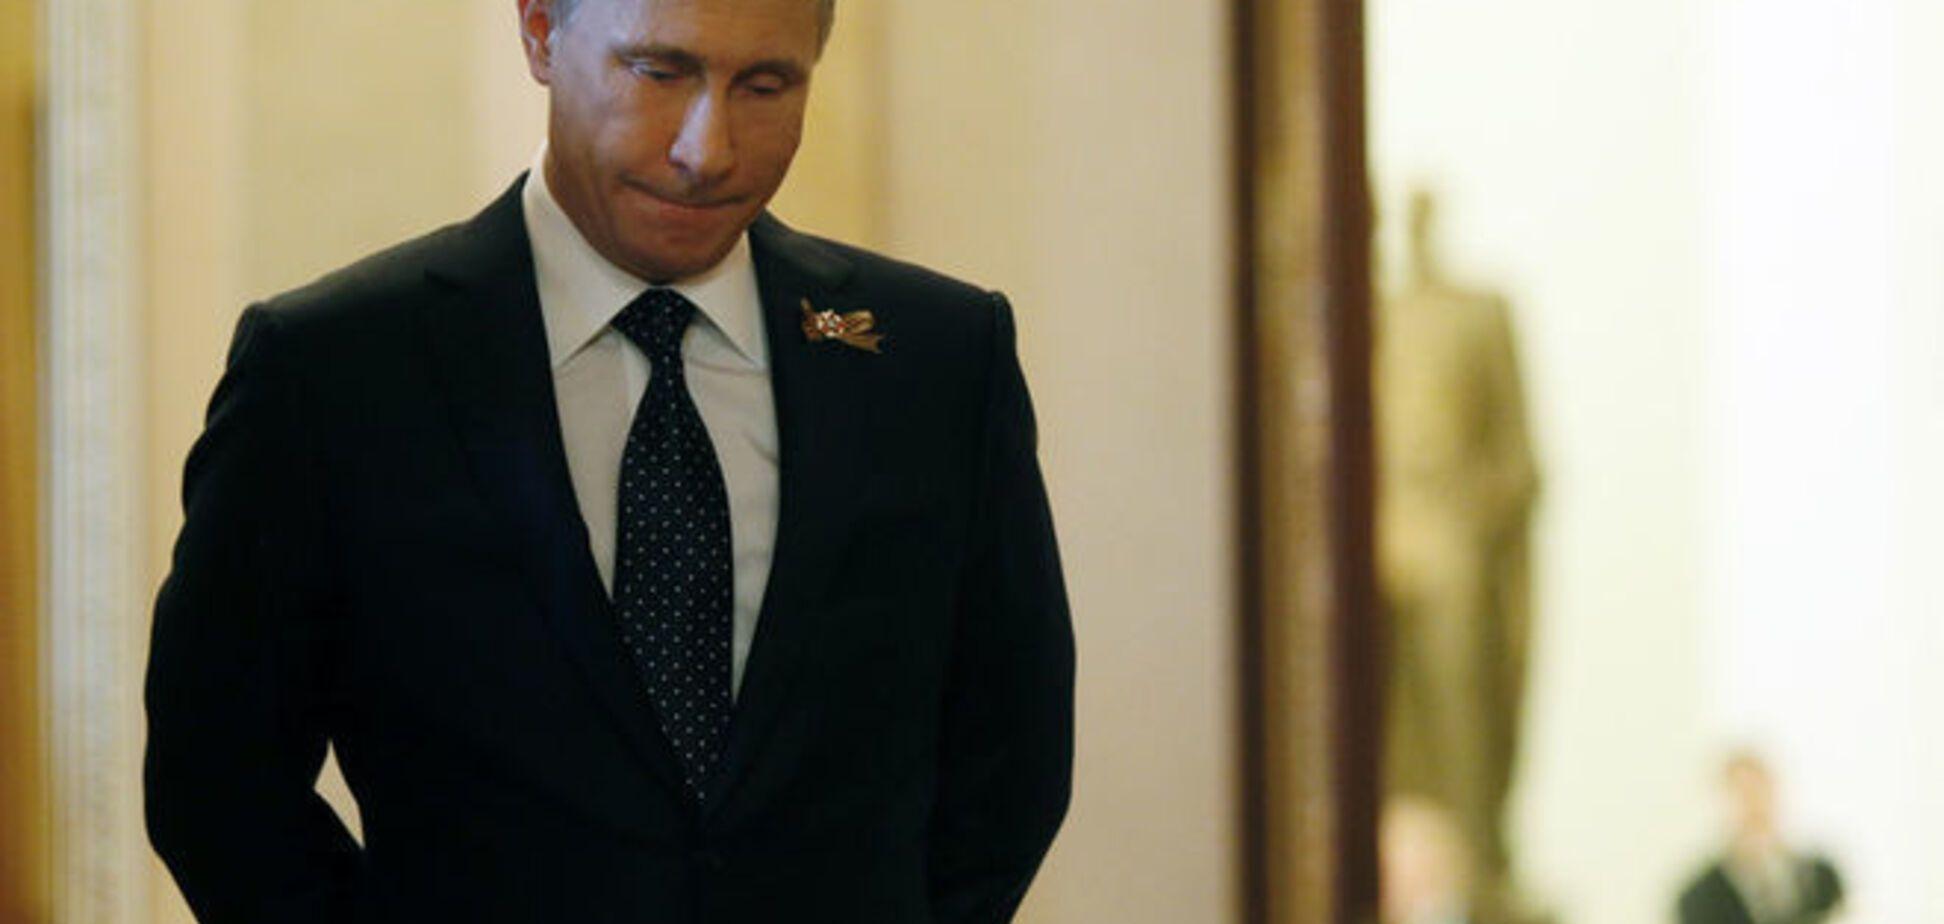 'Путин. Война': обнародован полный текст доклада Бориса Немцова